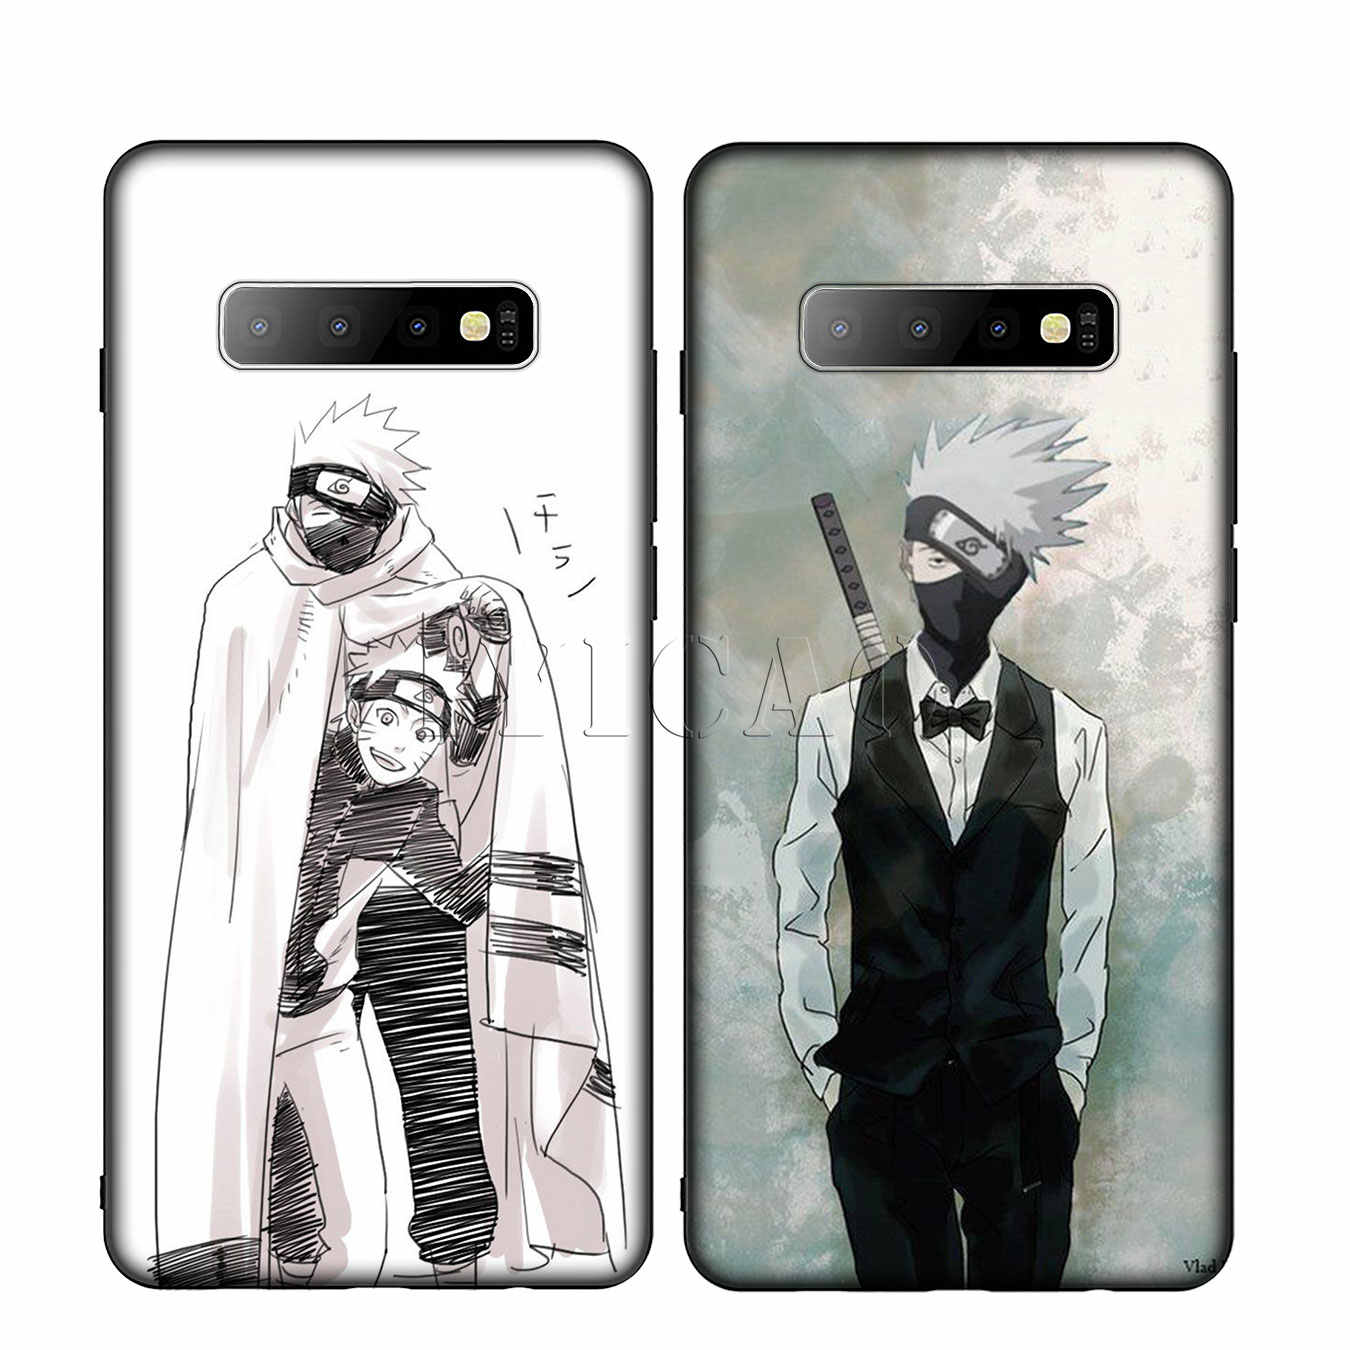 IYICAO naruto kakashi Caso de Telefone de Silicone Macio para Samsung Galaxy S10 S9 S8 Plus S6 S7 Borda S10e E Tampa